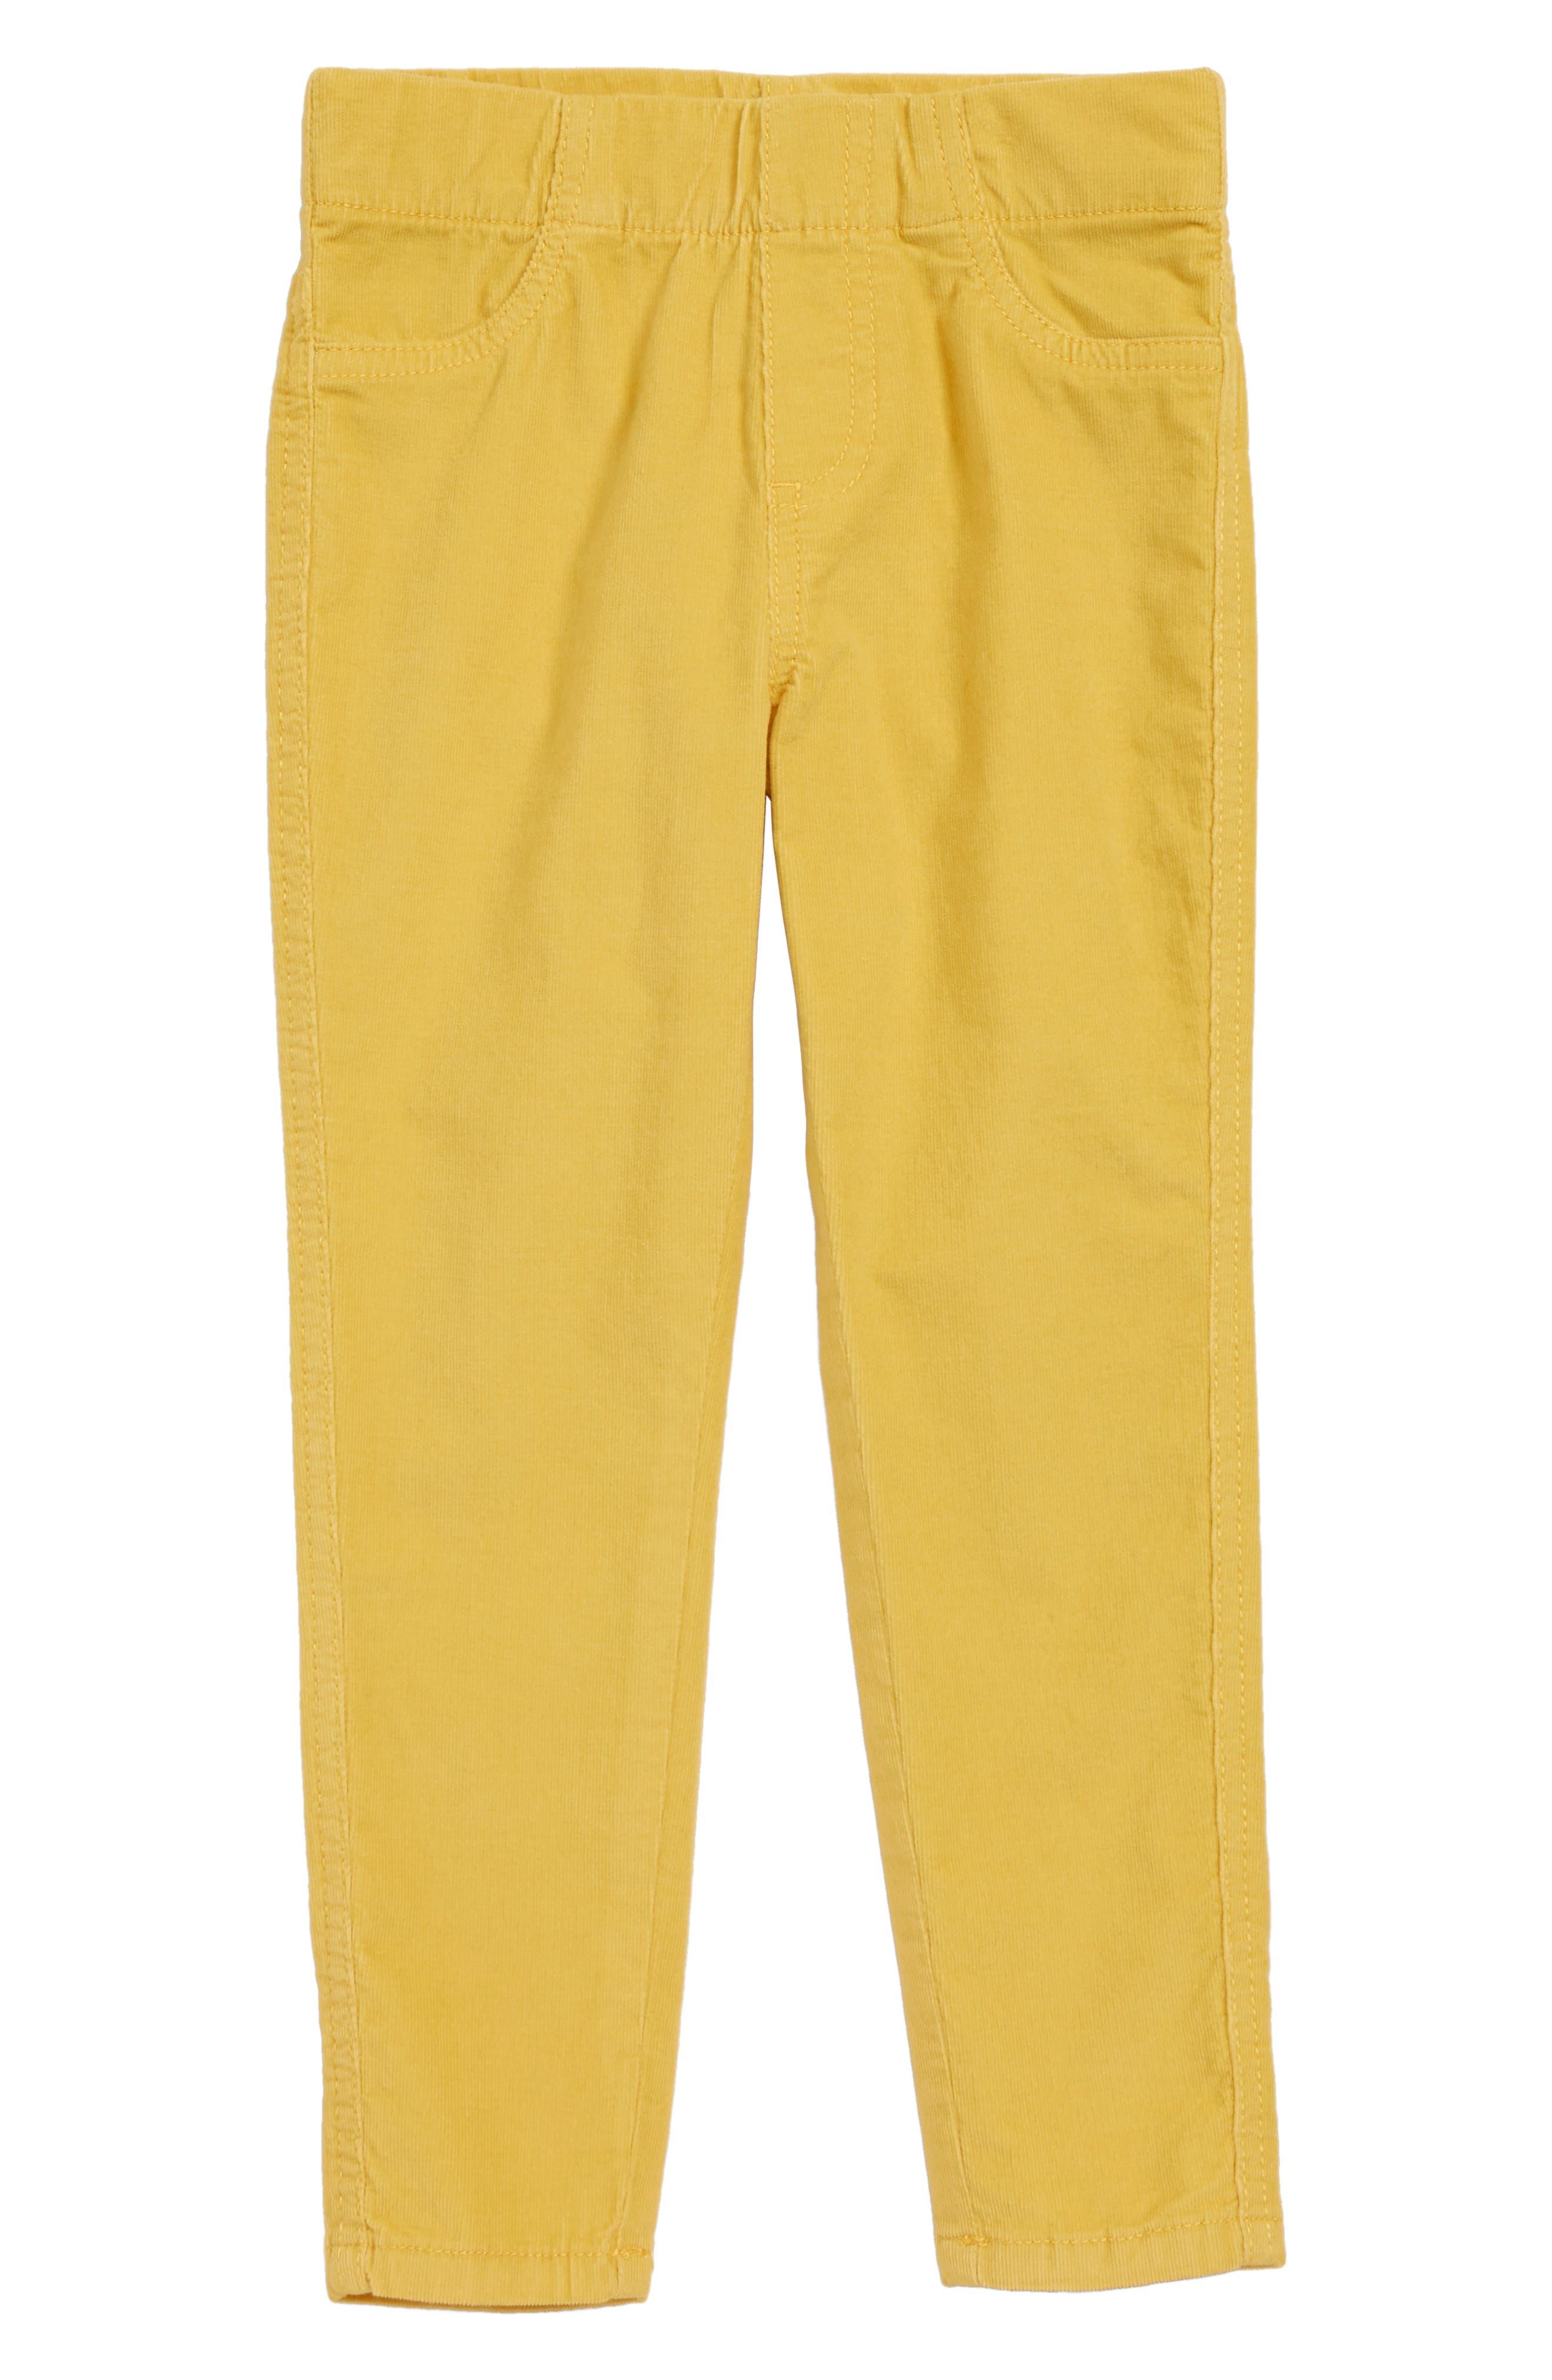 Pull-On Corduroy Pants,                         Main,                         color, YELLOW FUN